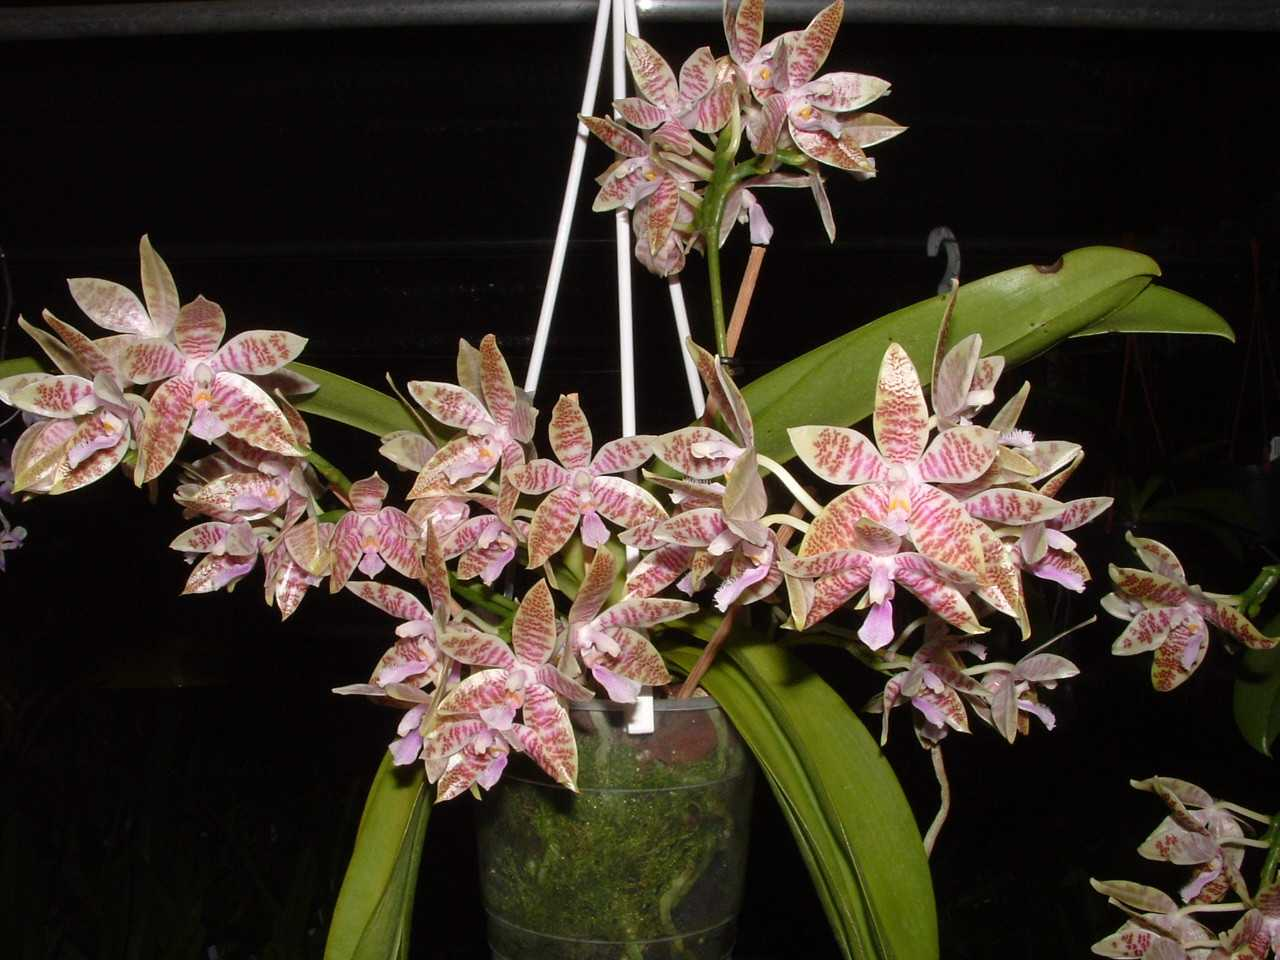 orhideya-falenopsis-foto-video-vidyi-falenopsis-harakteristika-i-opisanie-2